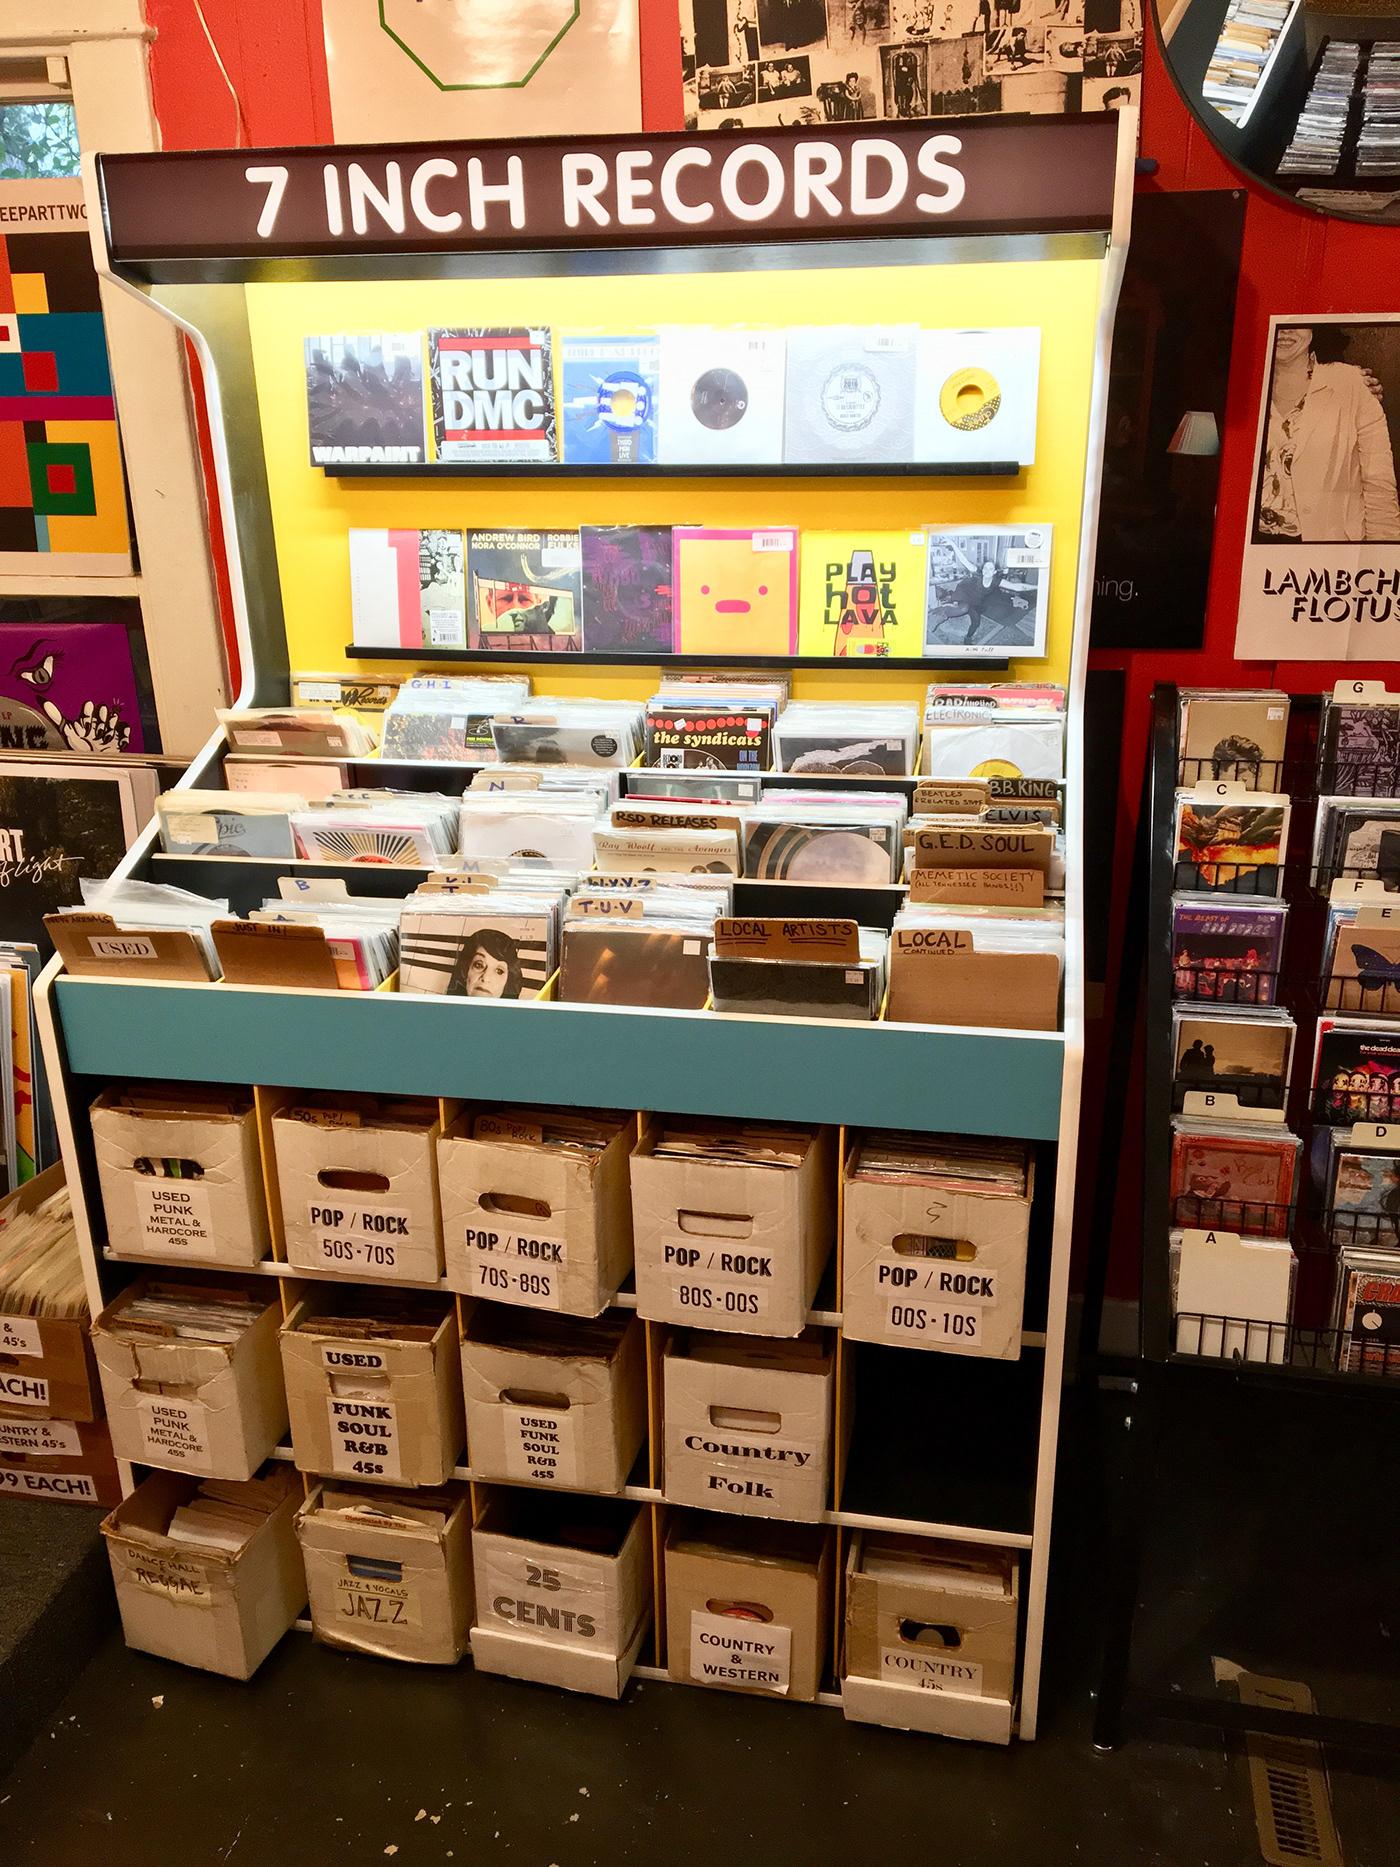 45rpm Record Shelf on RISD Portfolios